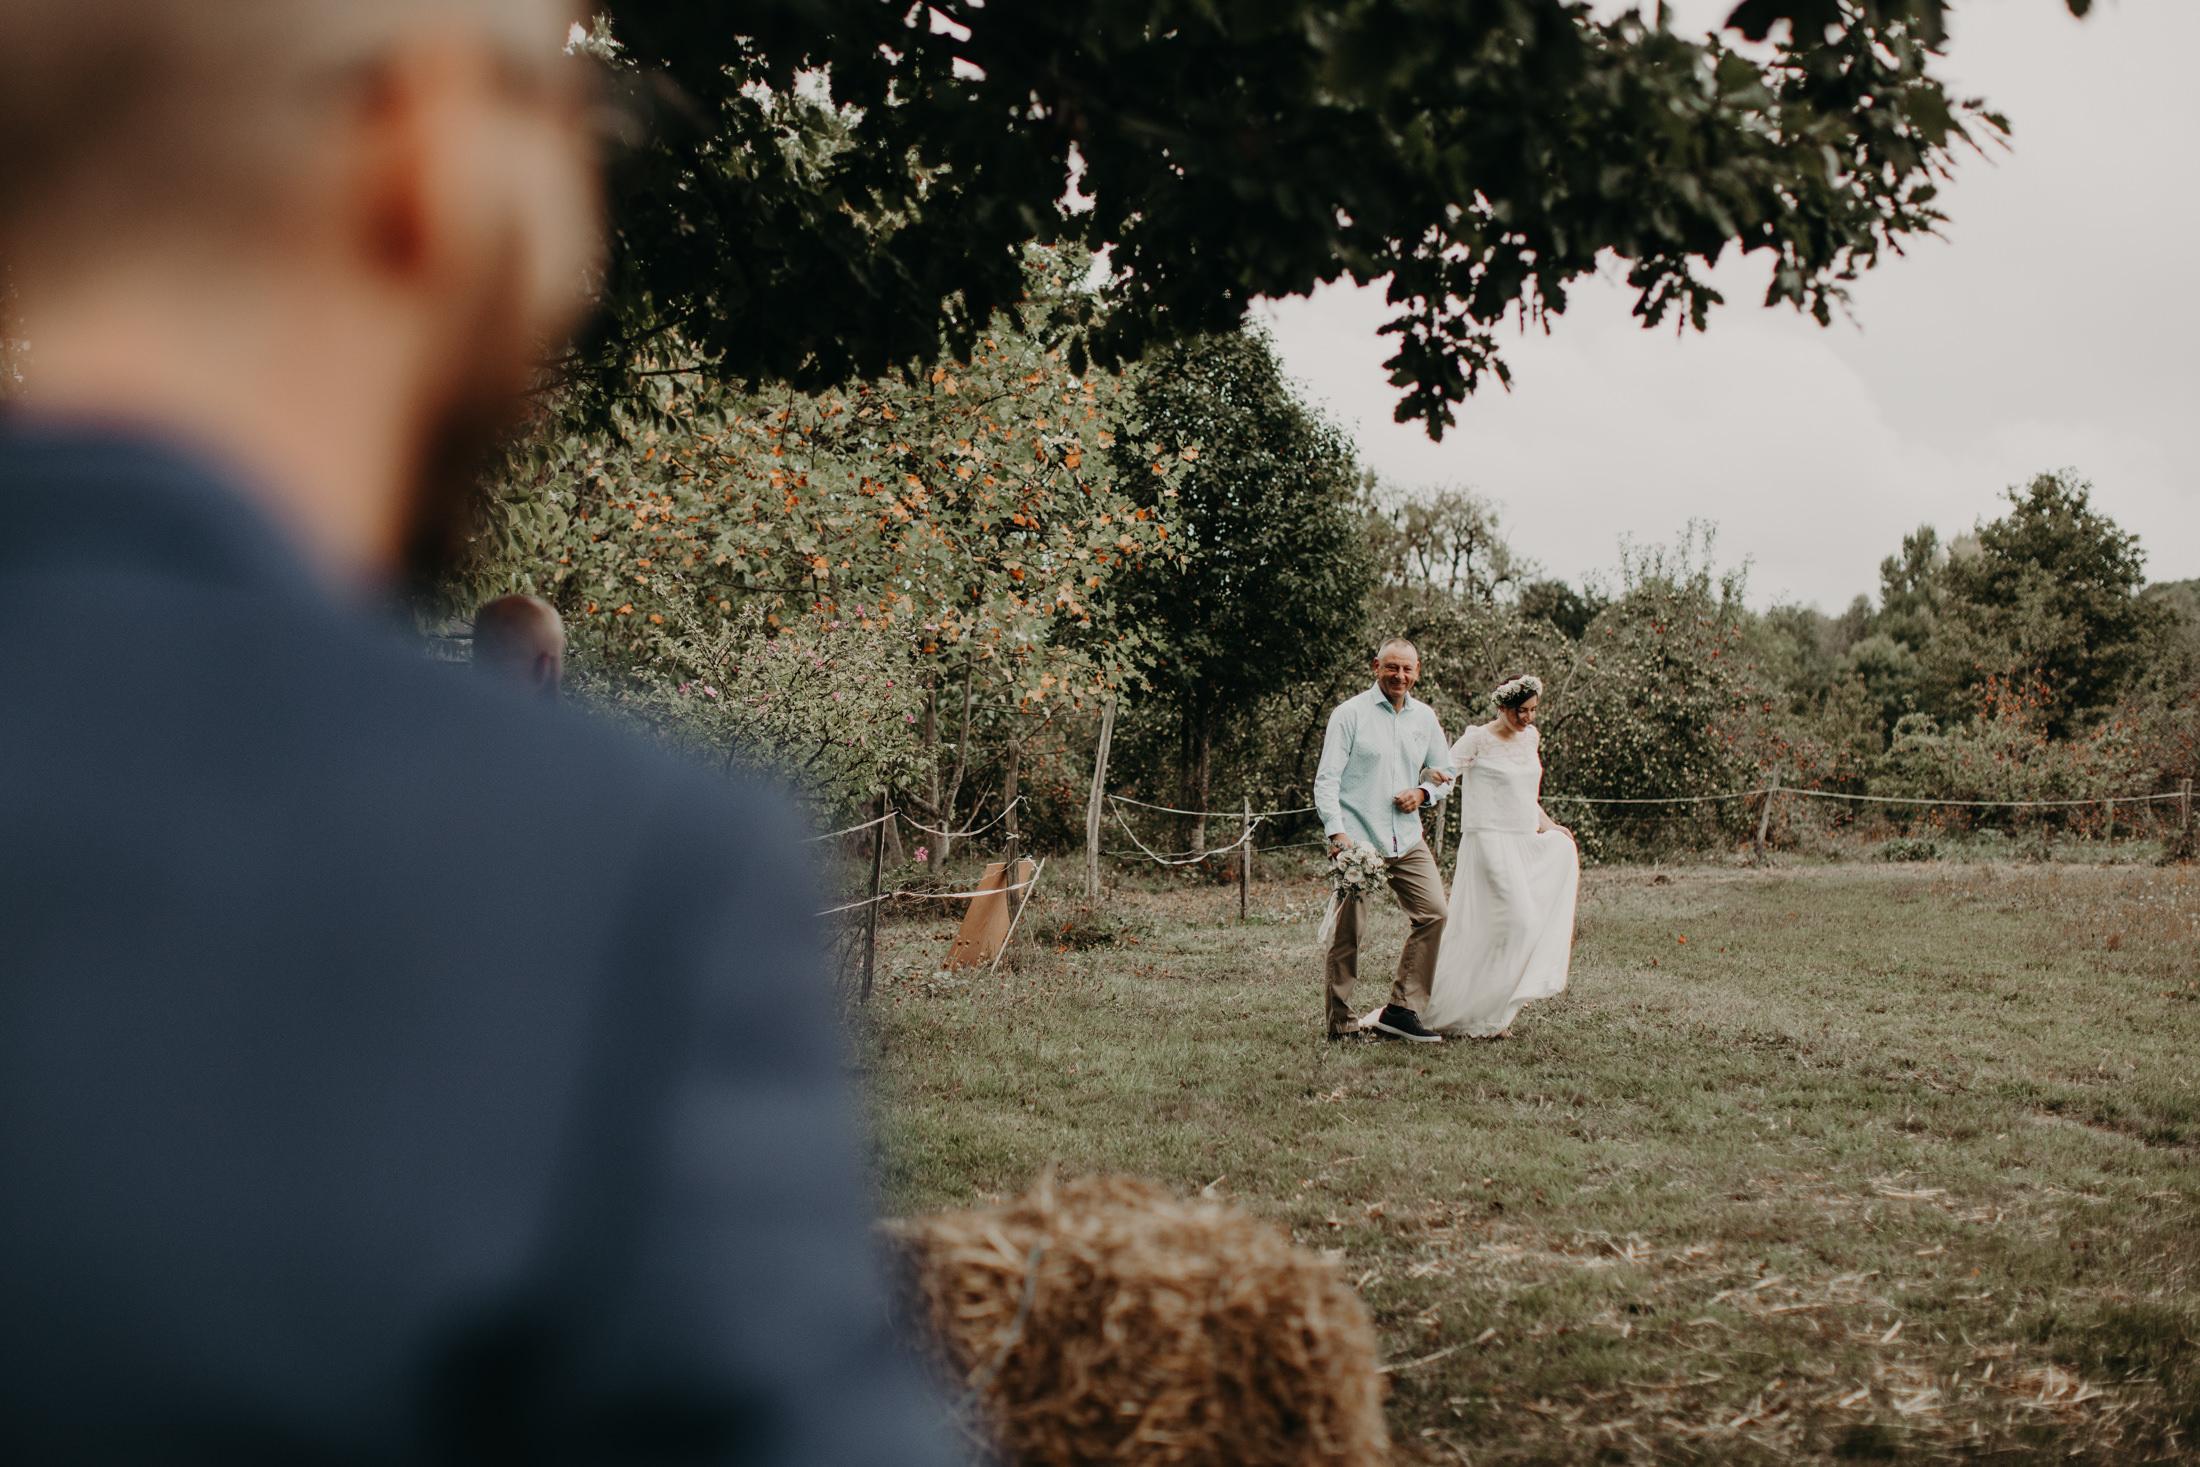 Mariage alsace germany wedding kid-36.jpg